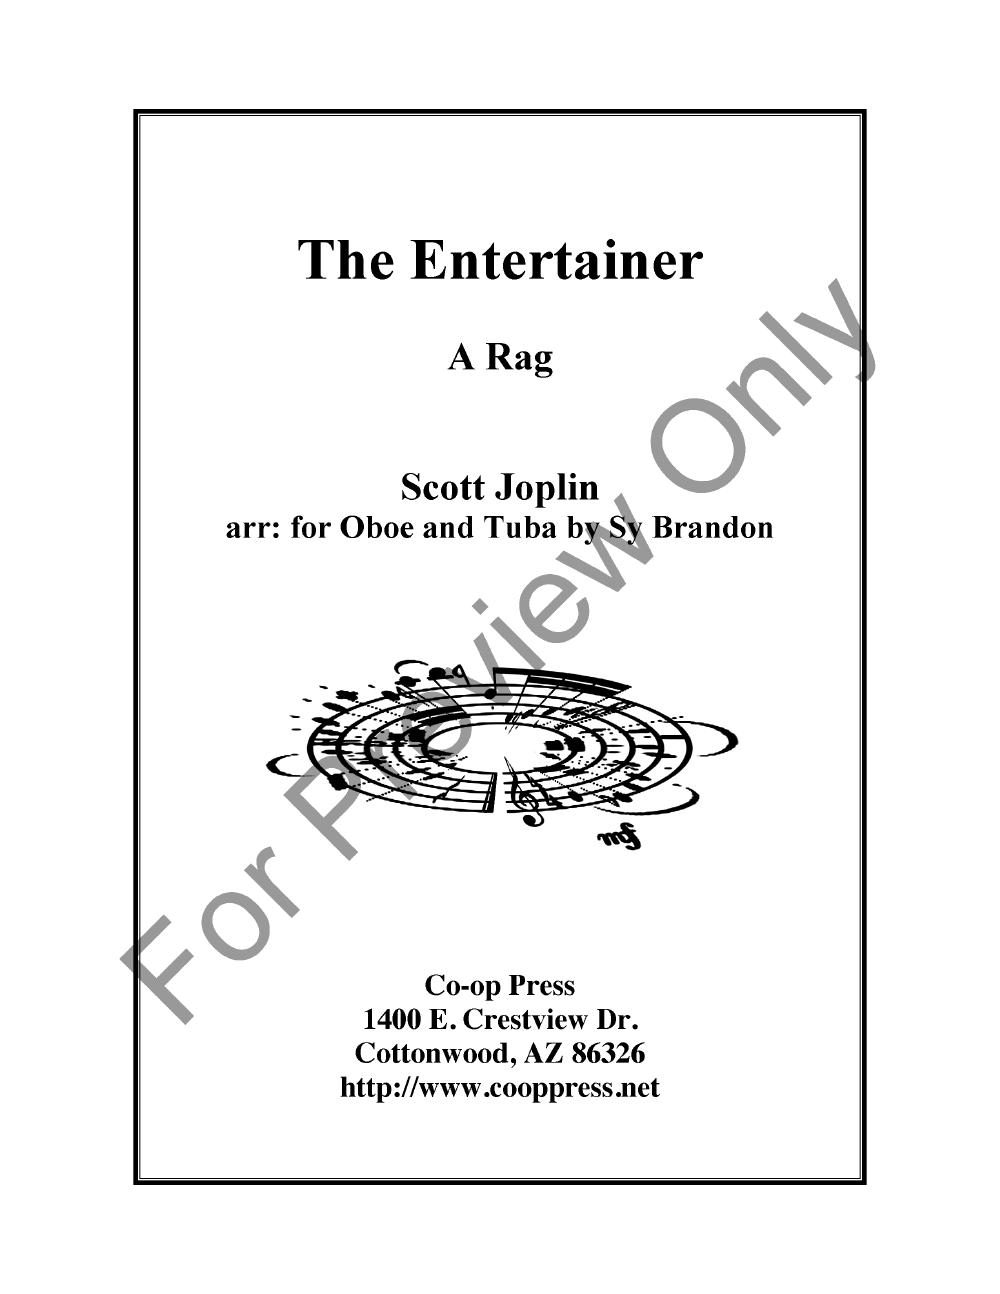 The Entertainer Thumbnail